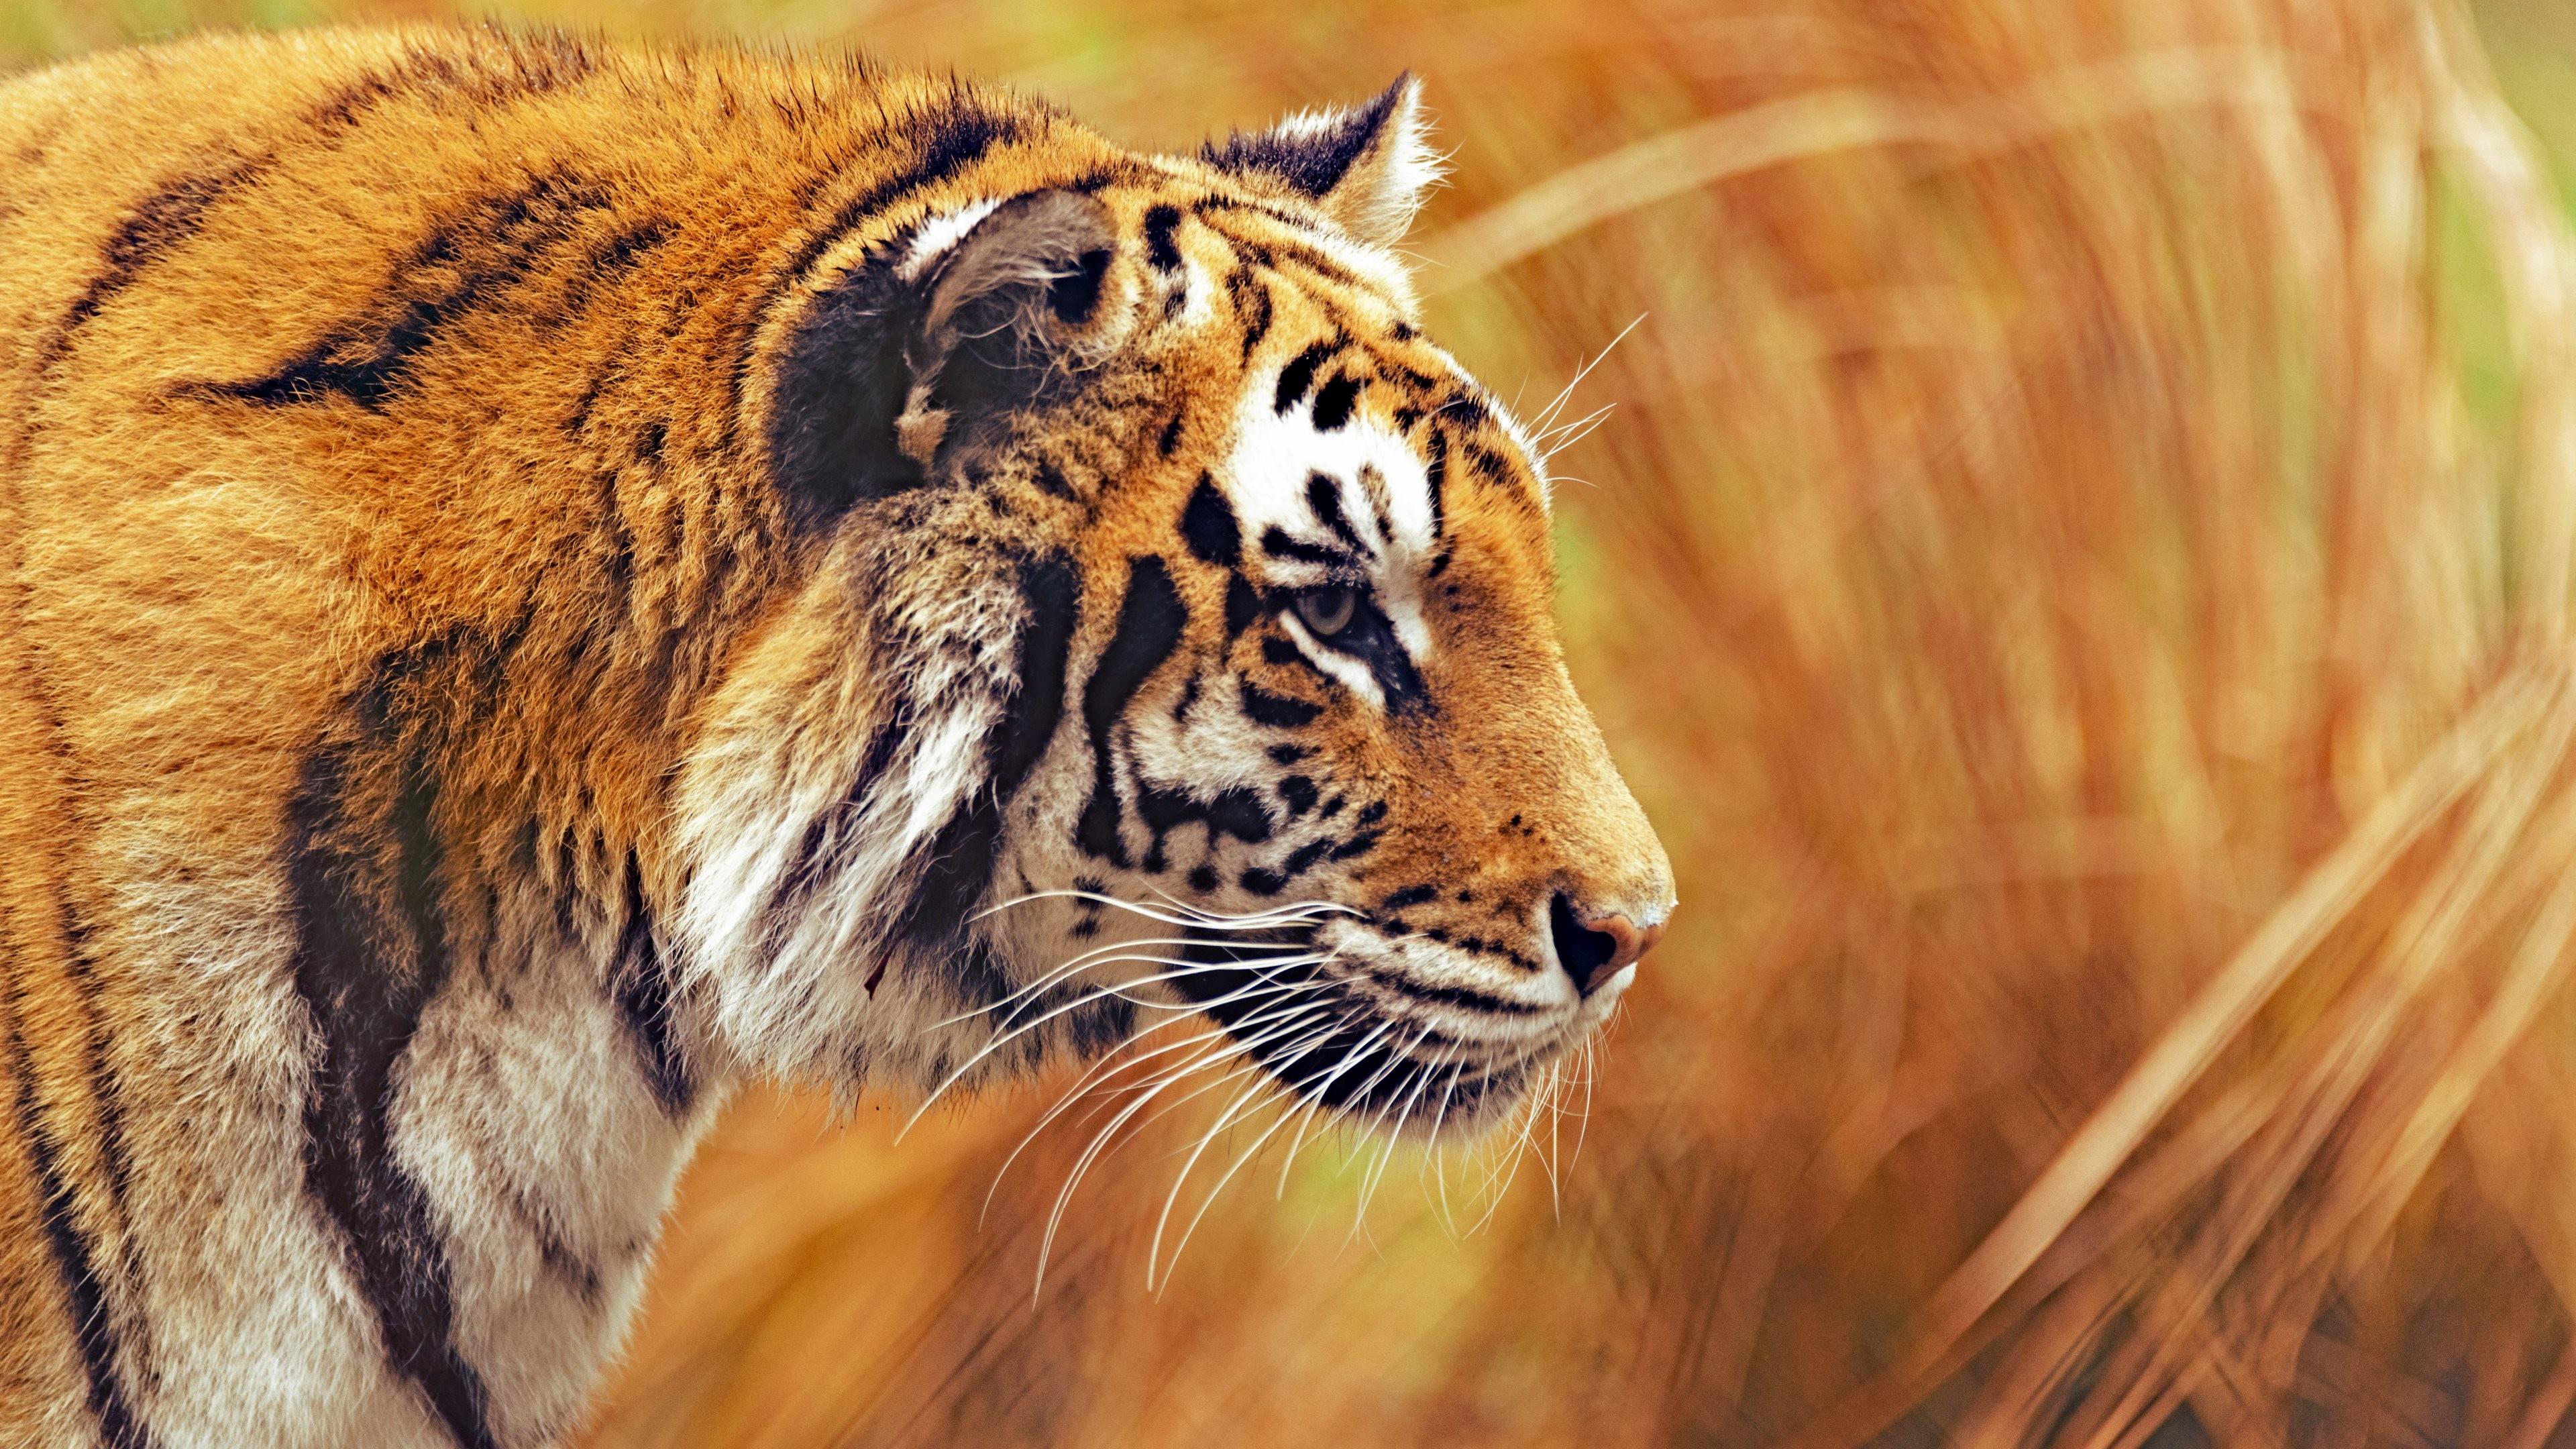 Leopard 4k Black Background Hd Animals 4k Wallpapers: Wallpaper Bengal Tiger, 5k, 4k Wallpaper, Grass, Yellow